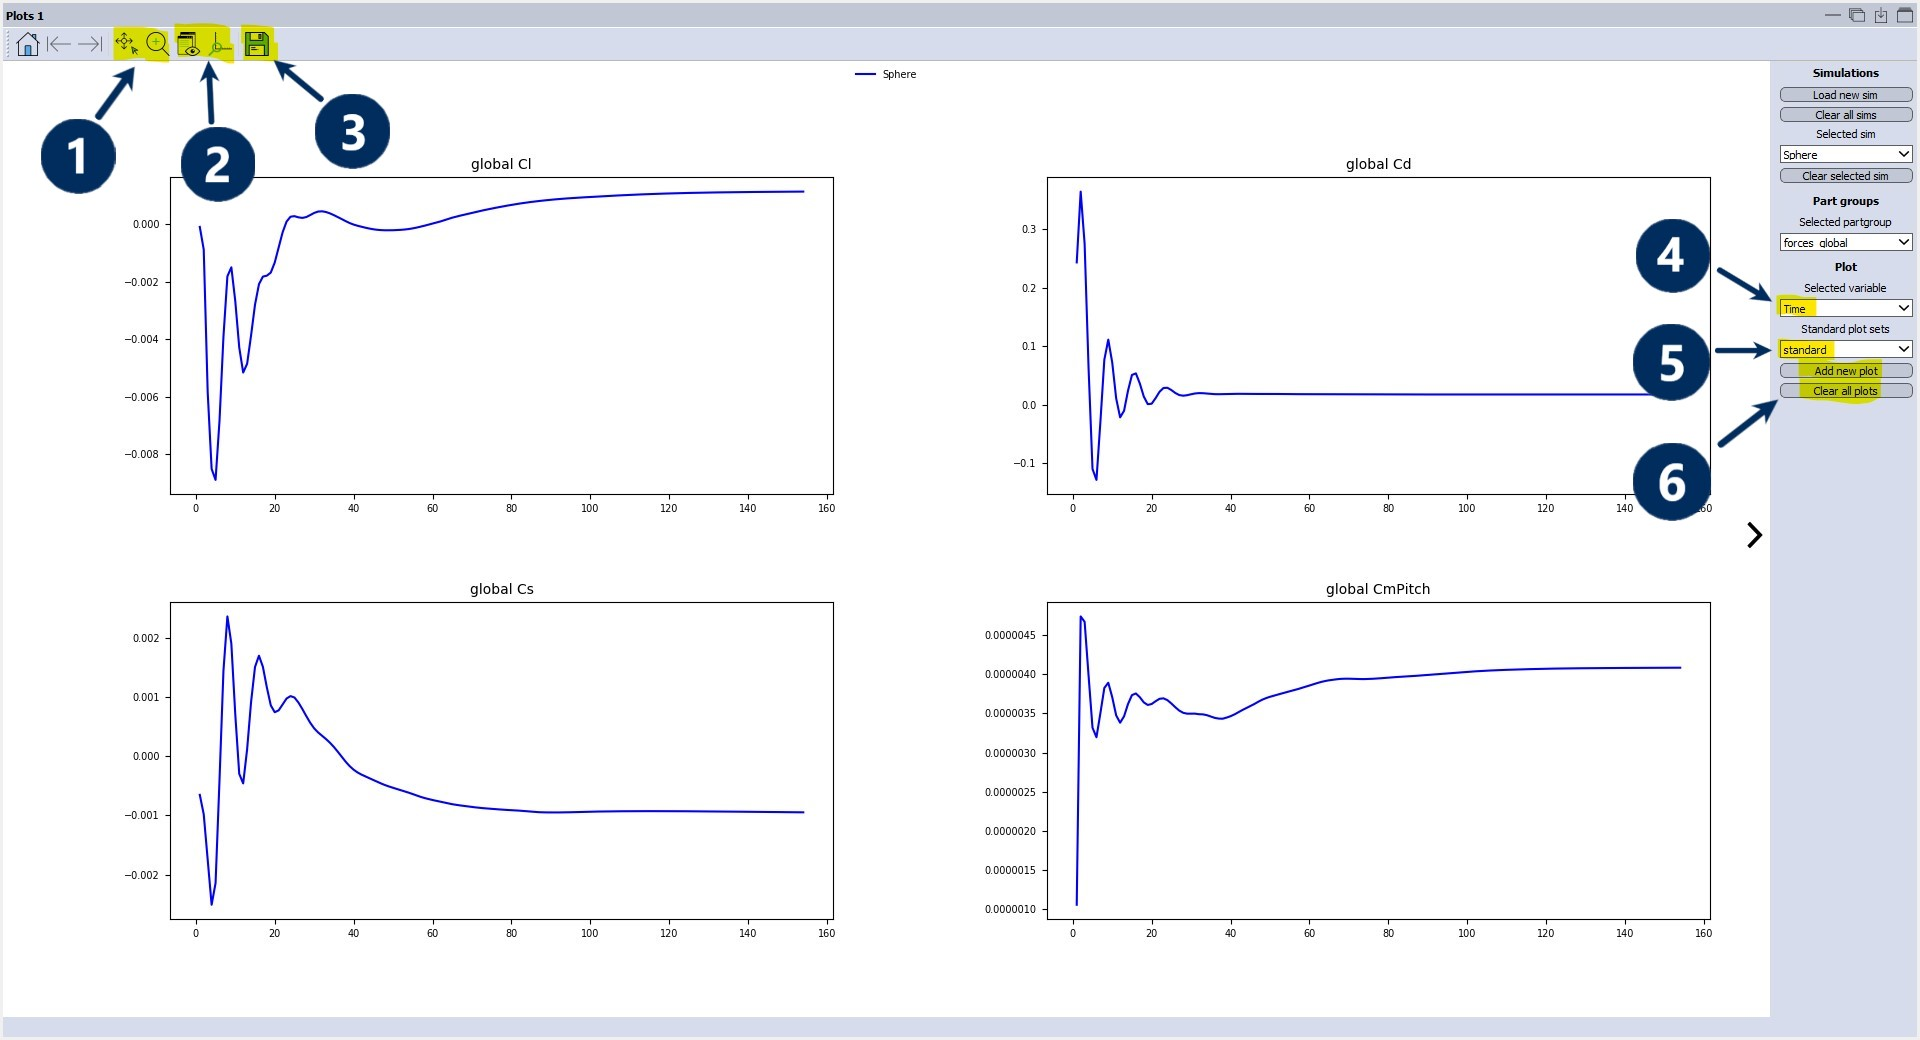 simworks plot functionality